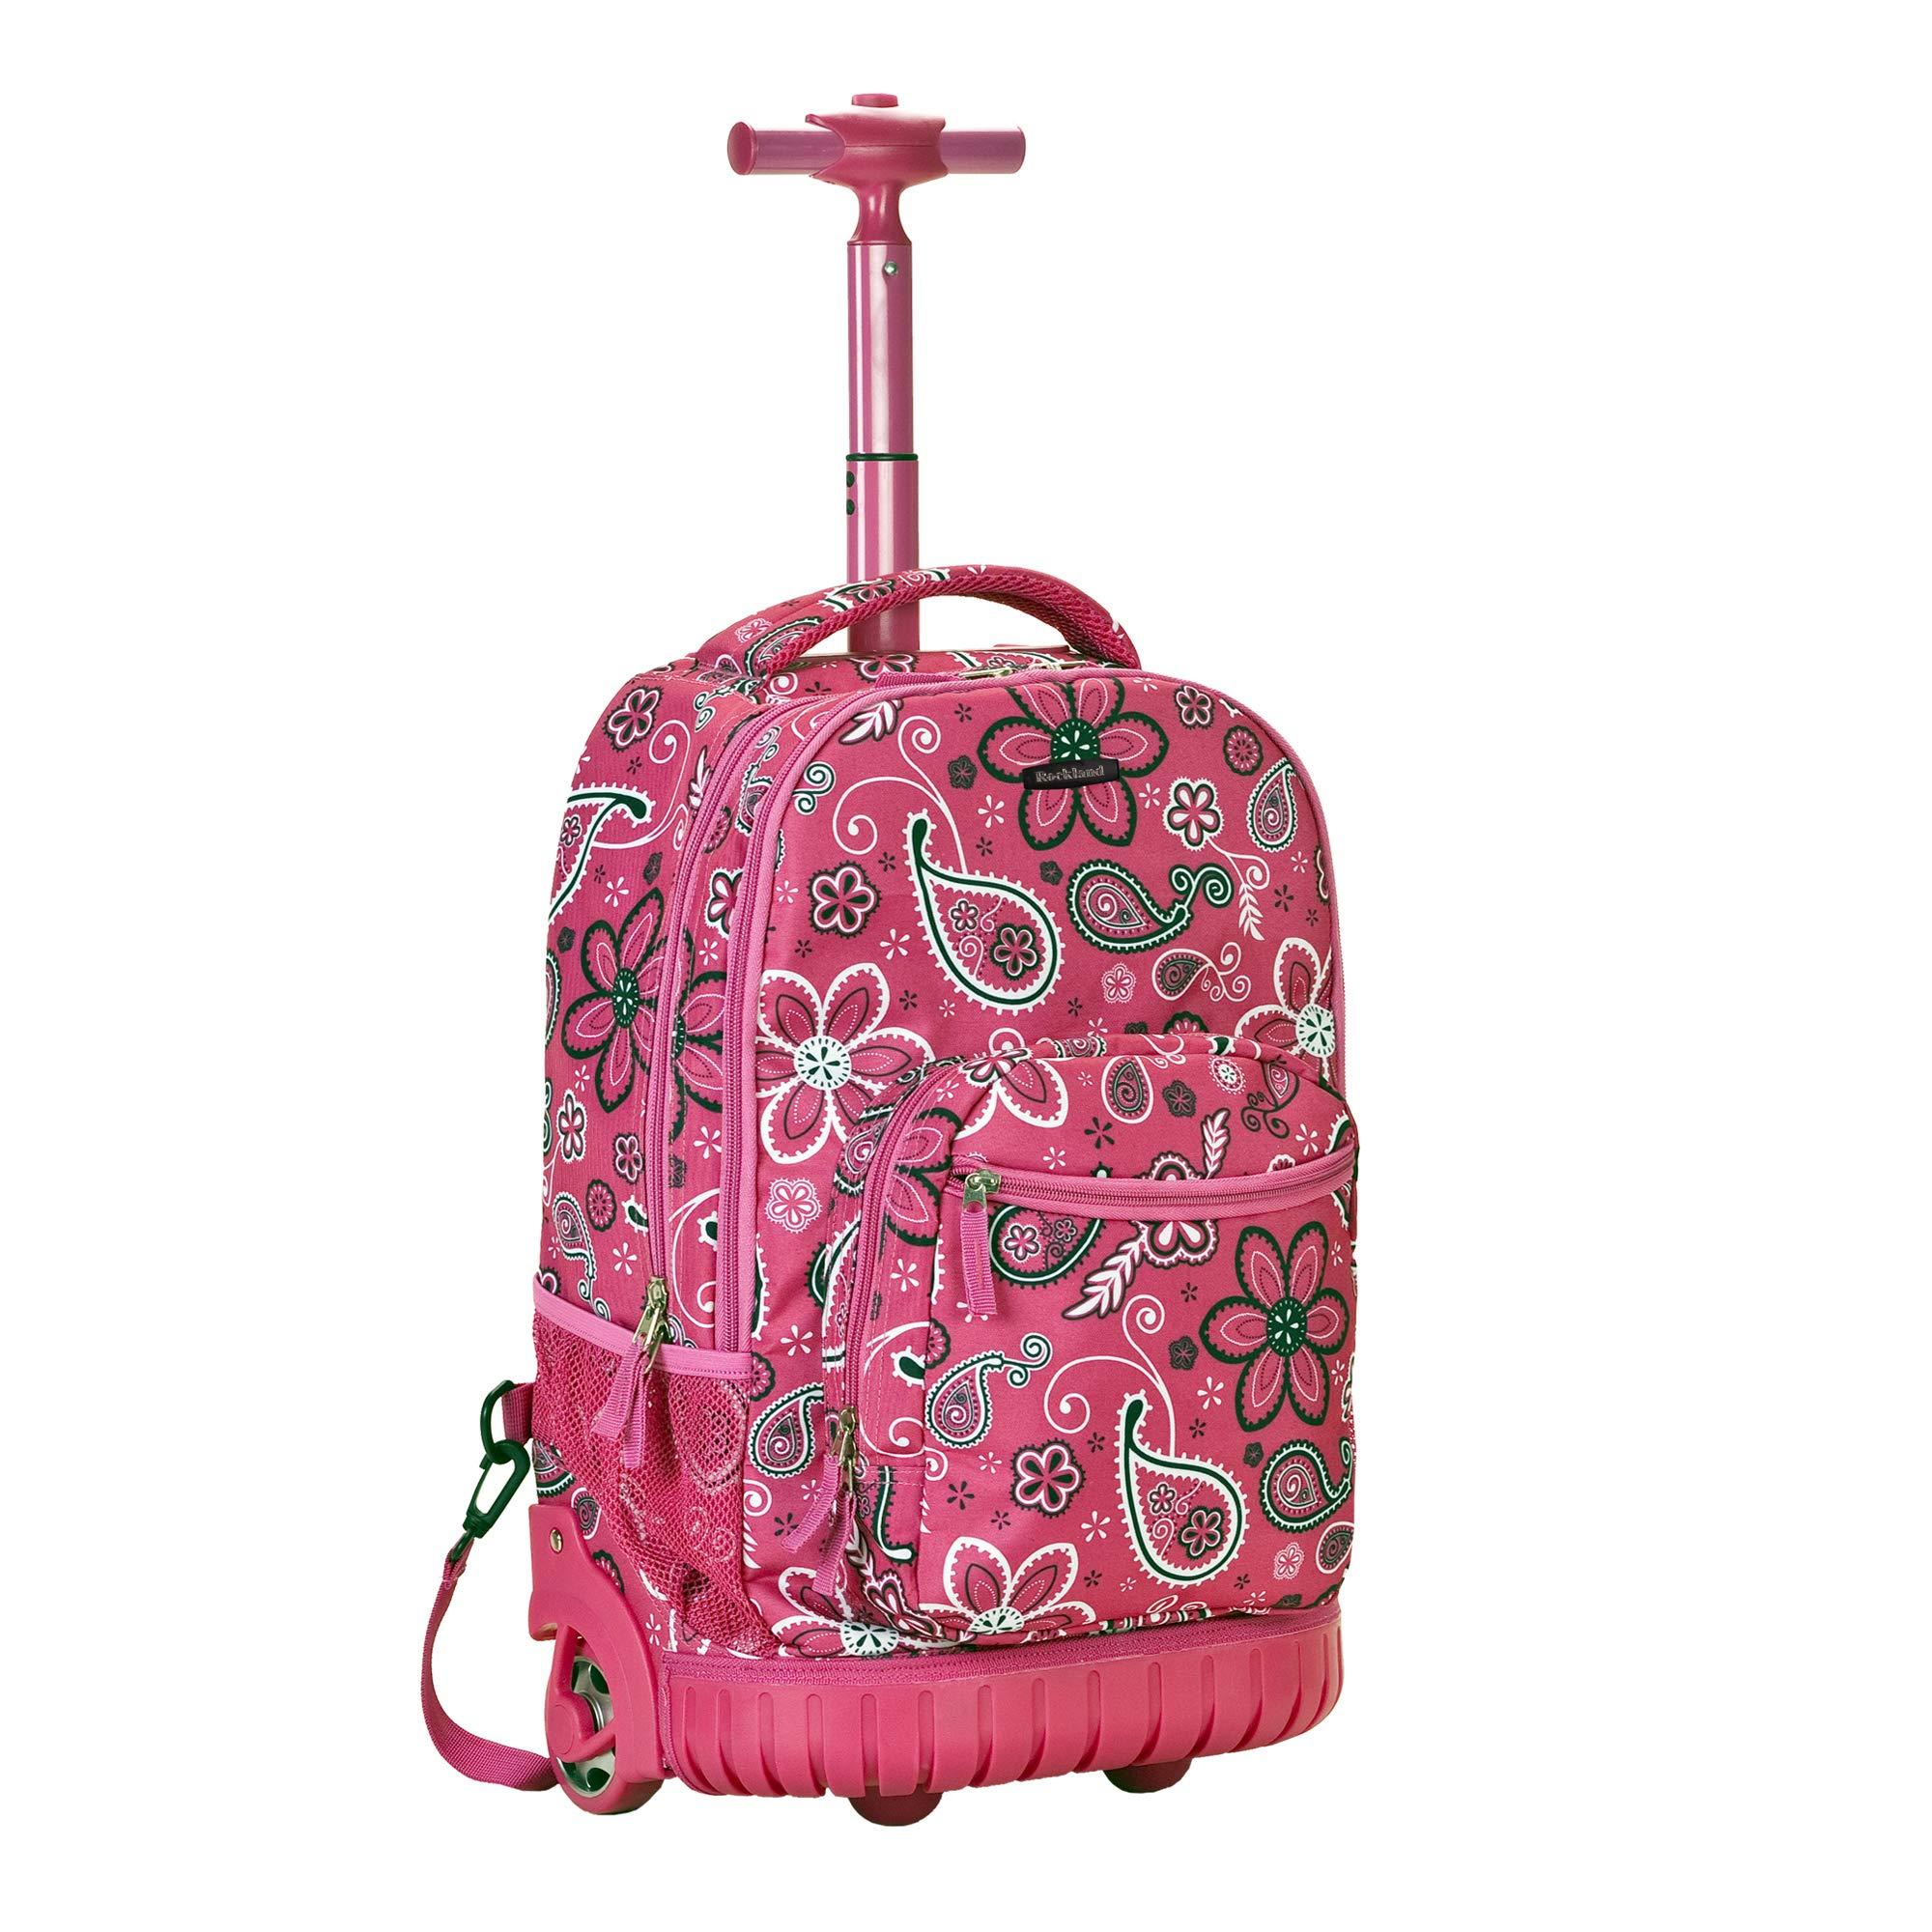 Rockland Luggage 19 Inch Rolling Backpack Printed, Bandana, Medium